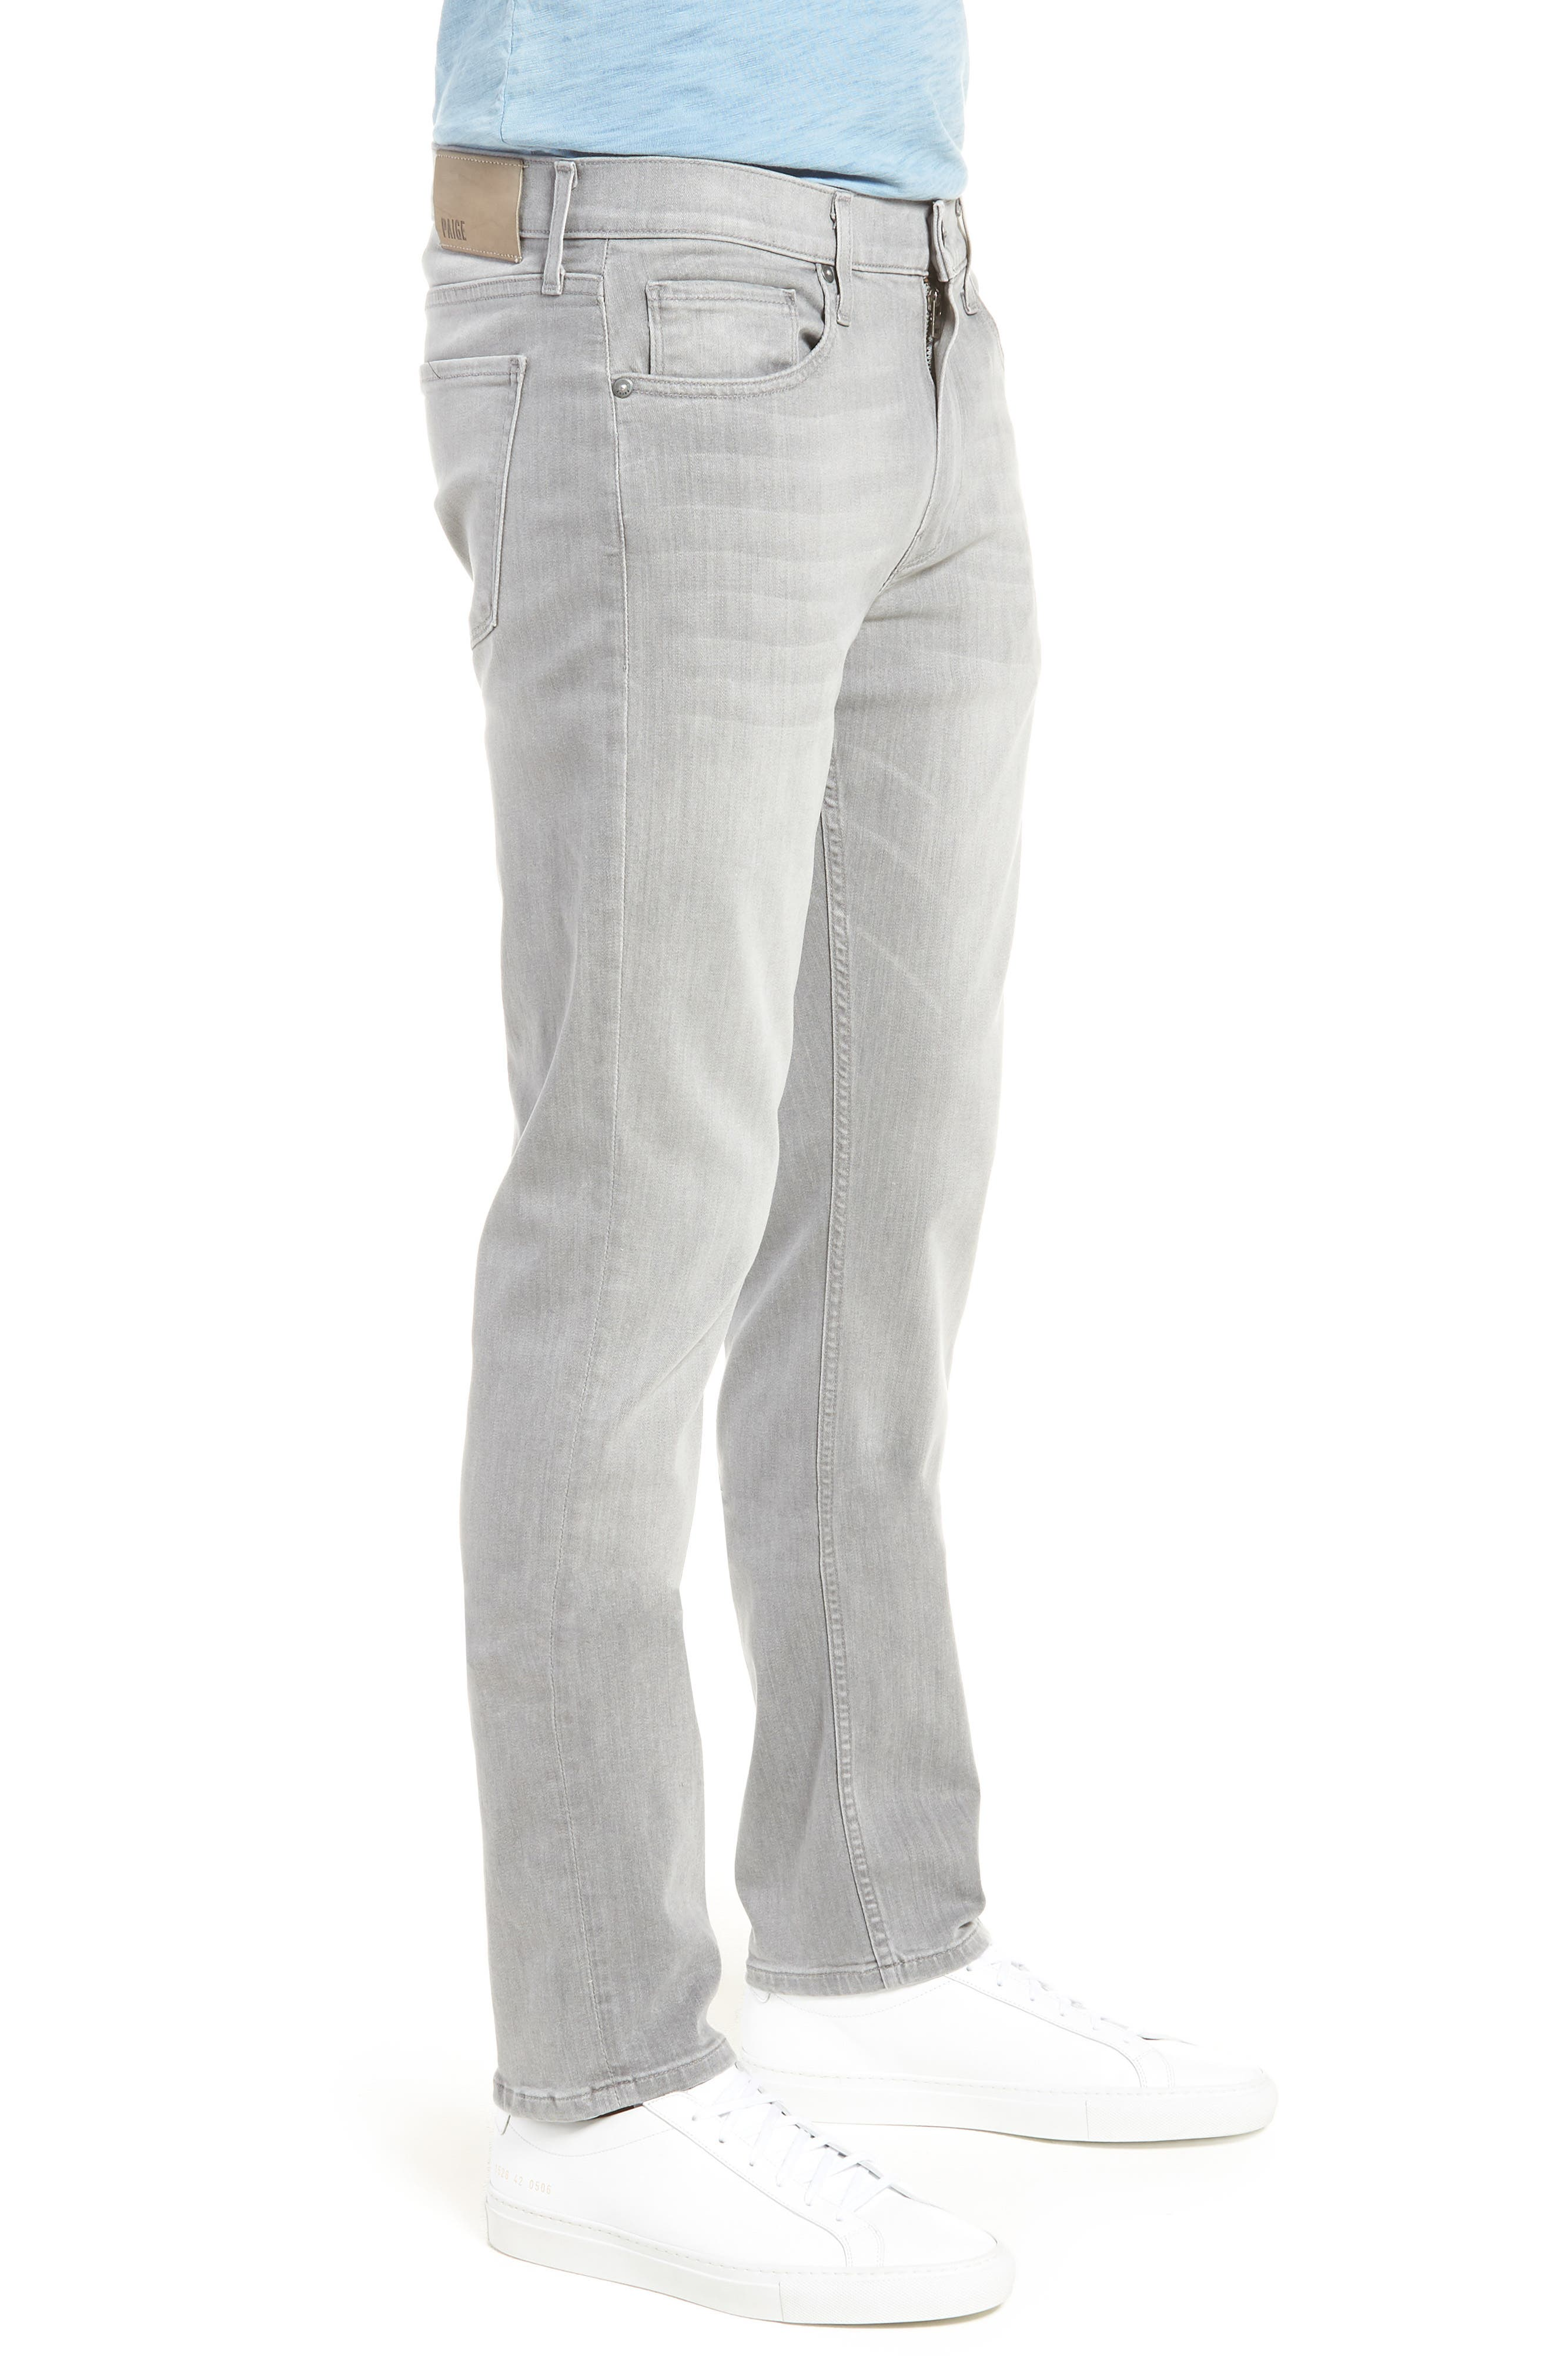 Transcend - Lennox Slim Fit Jeans,                             Alternate thumbnail 3, color,                             Mannor